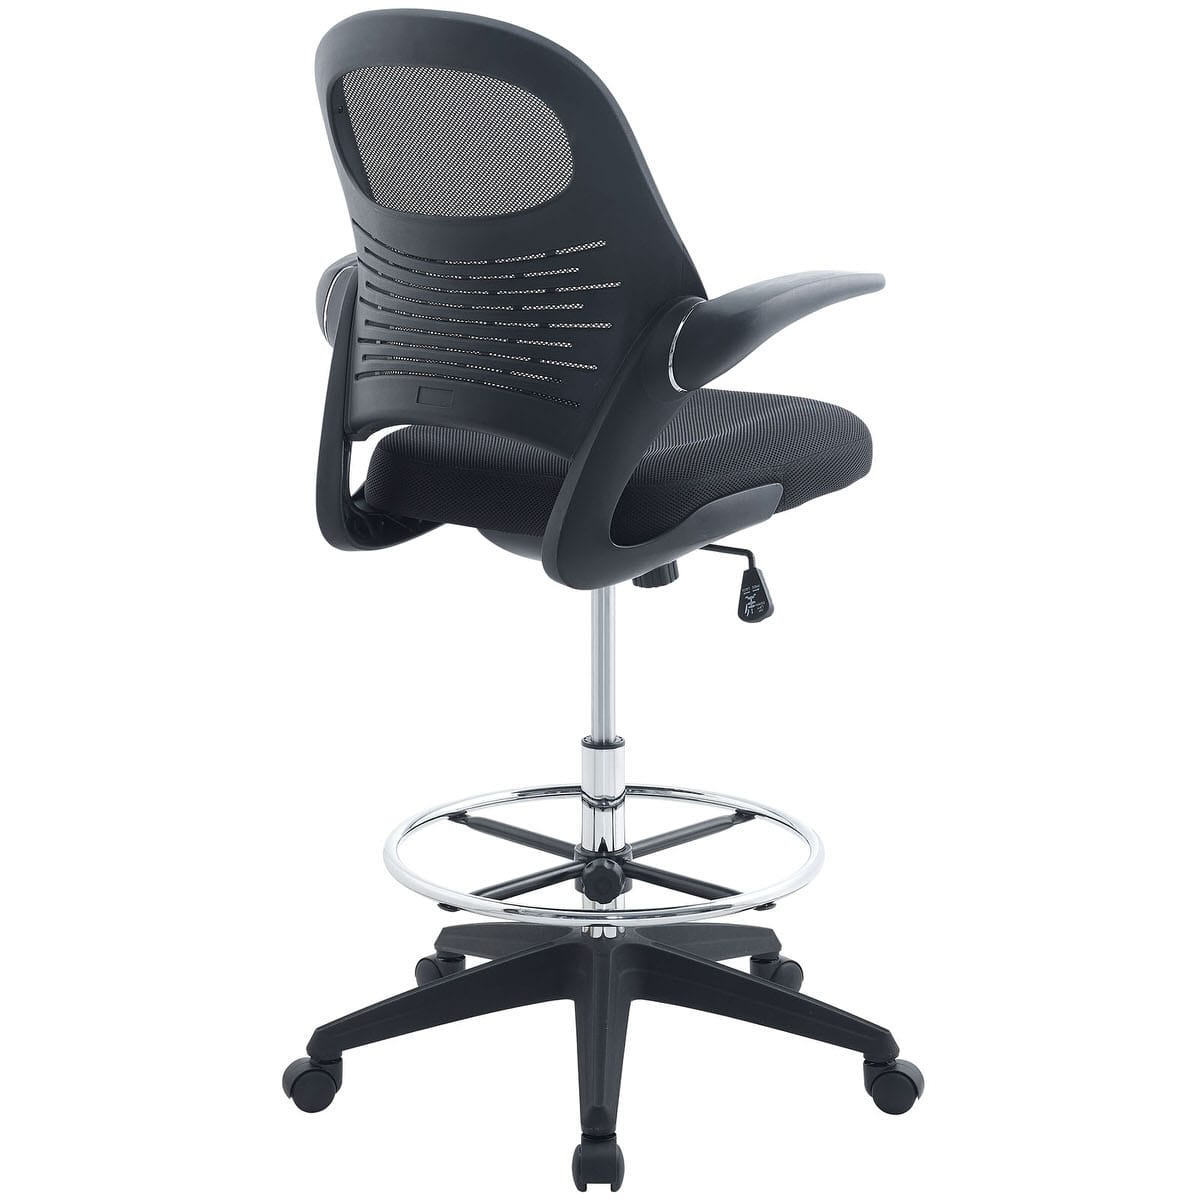 modern drafting chair hire covers edinburgh advance black by living